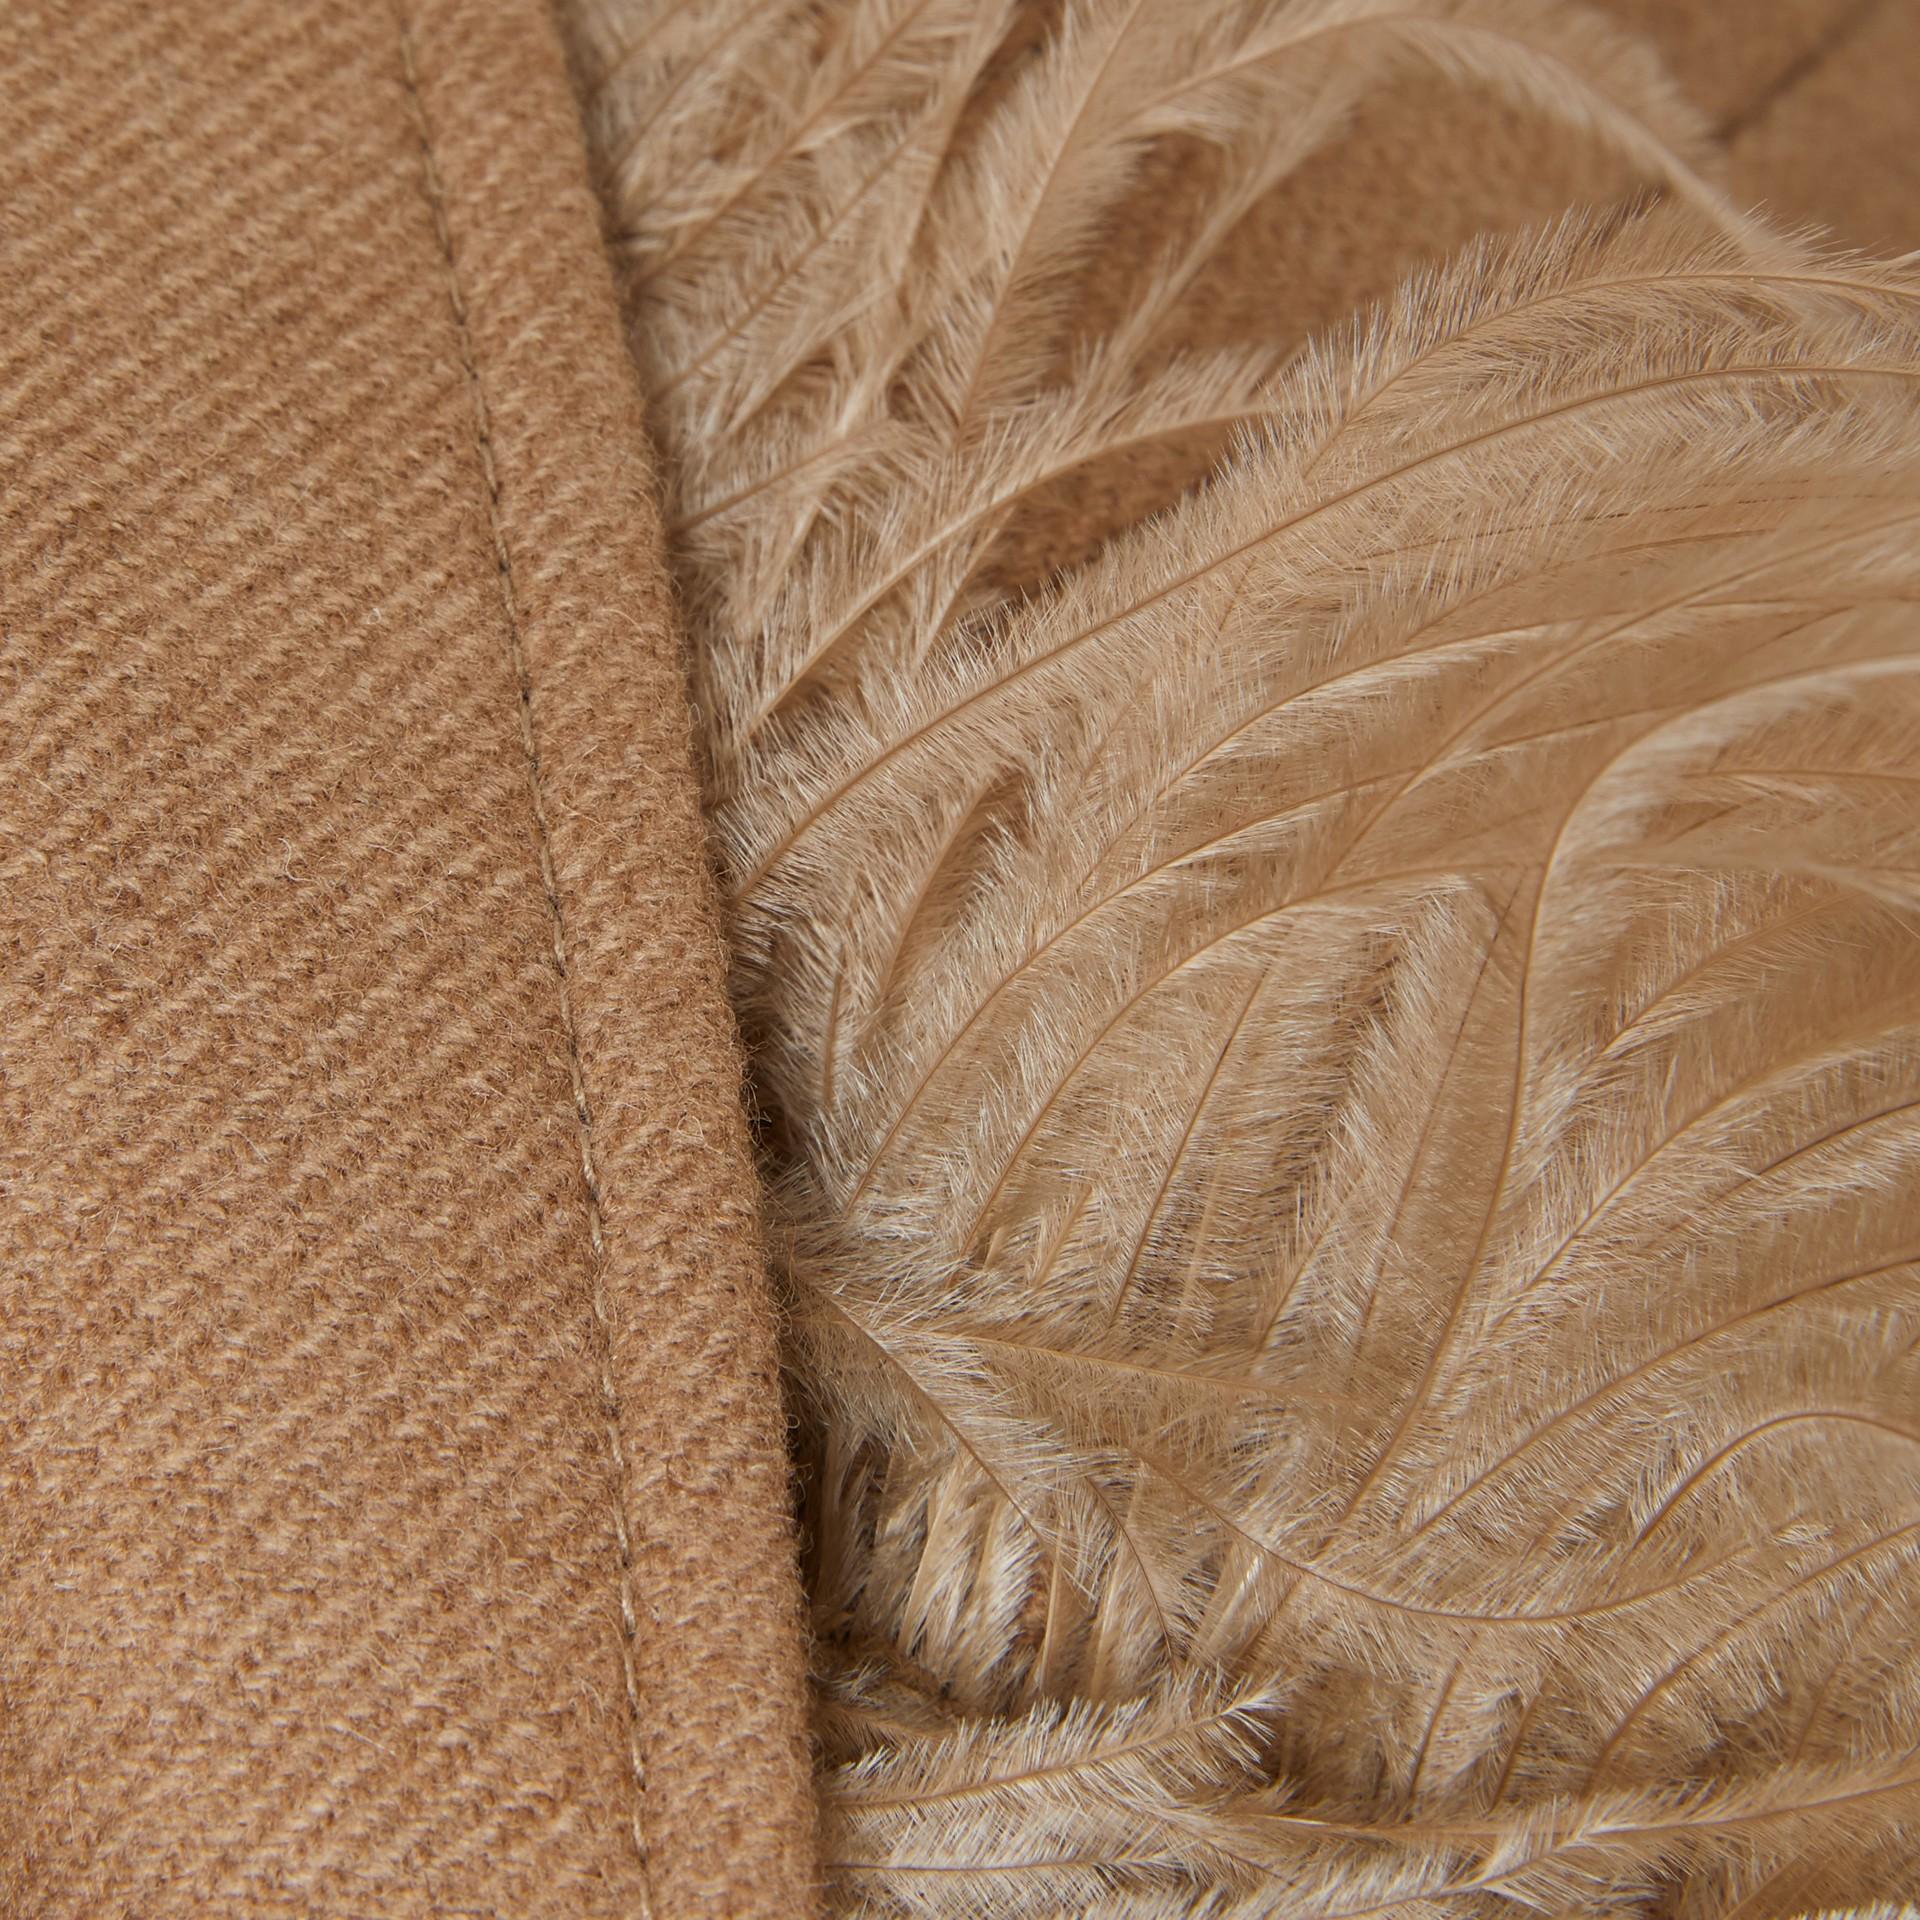 Abrigo de vestir en pelo de camello con detalle de plumas (Cámel) - Mujer | Burberry - imagen de la galería 7